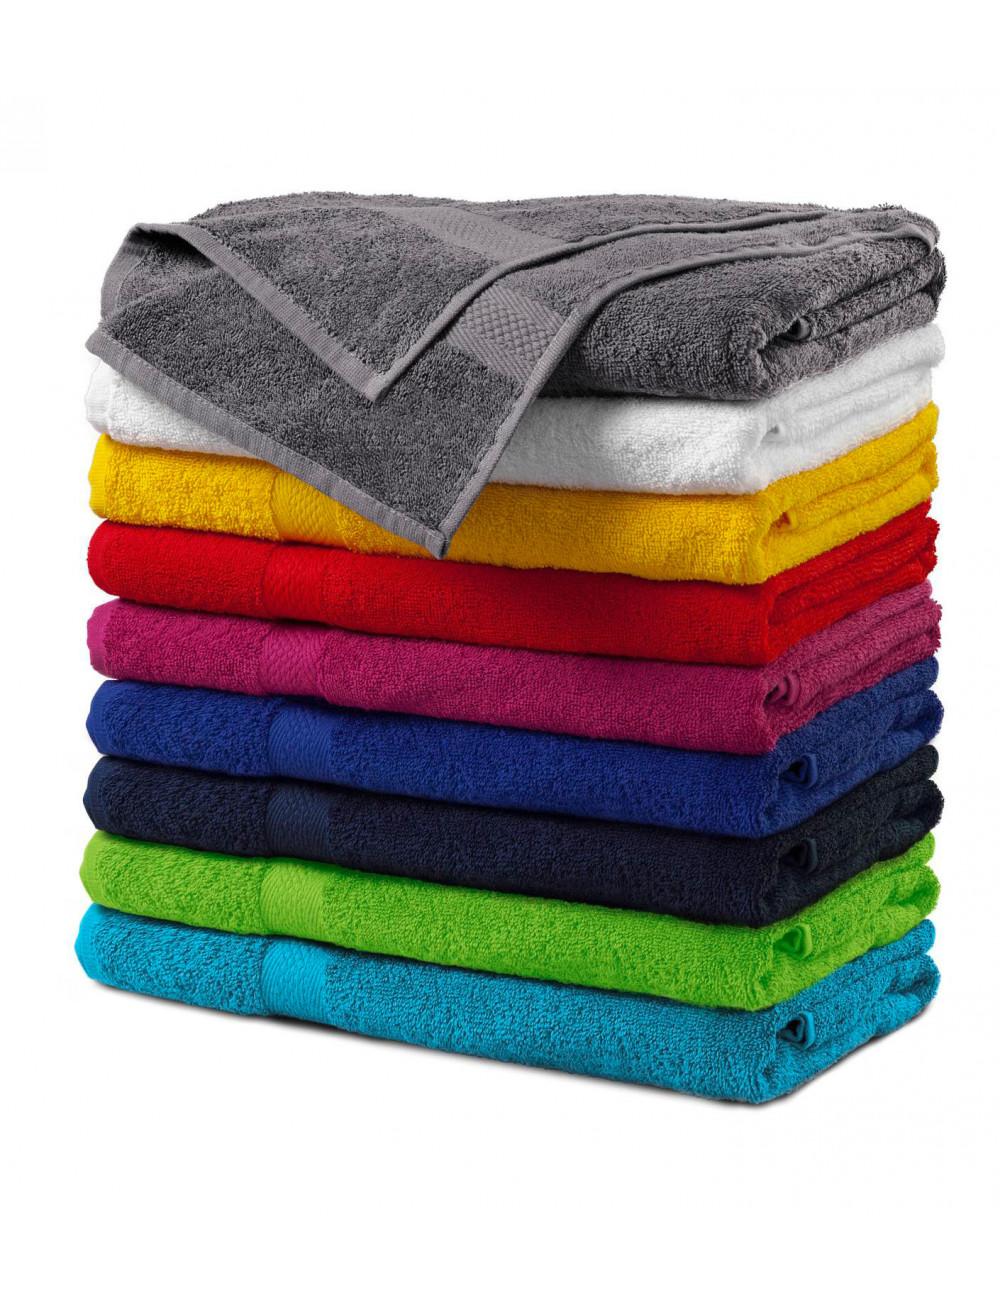 Adler MALFINI Ręcznik duży unisex Terry Bath Towel 905 granatowy